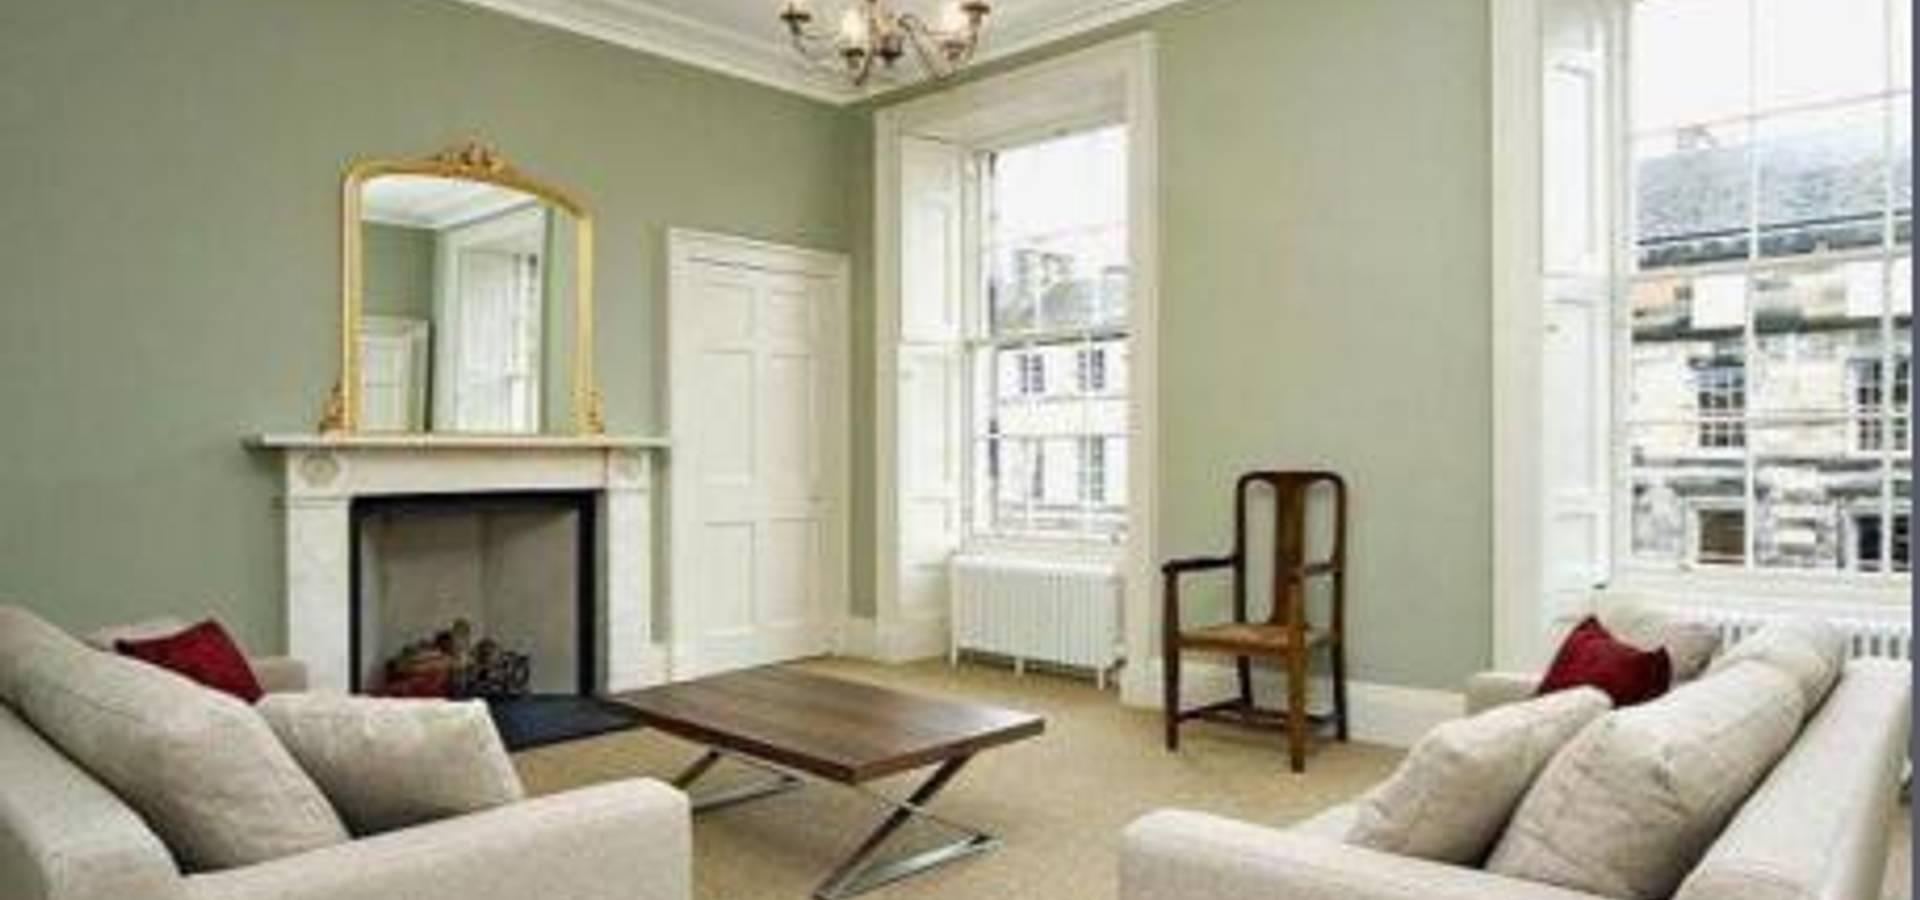 Hamill Decorating Services Interior Designers Decorators In